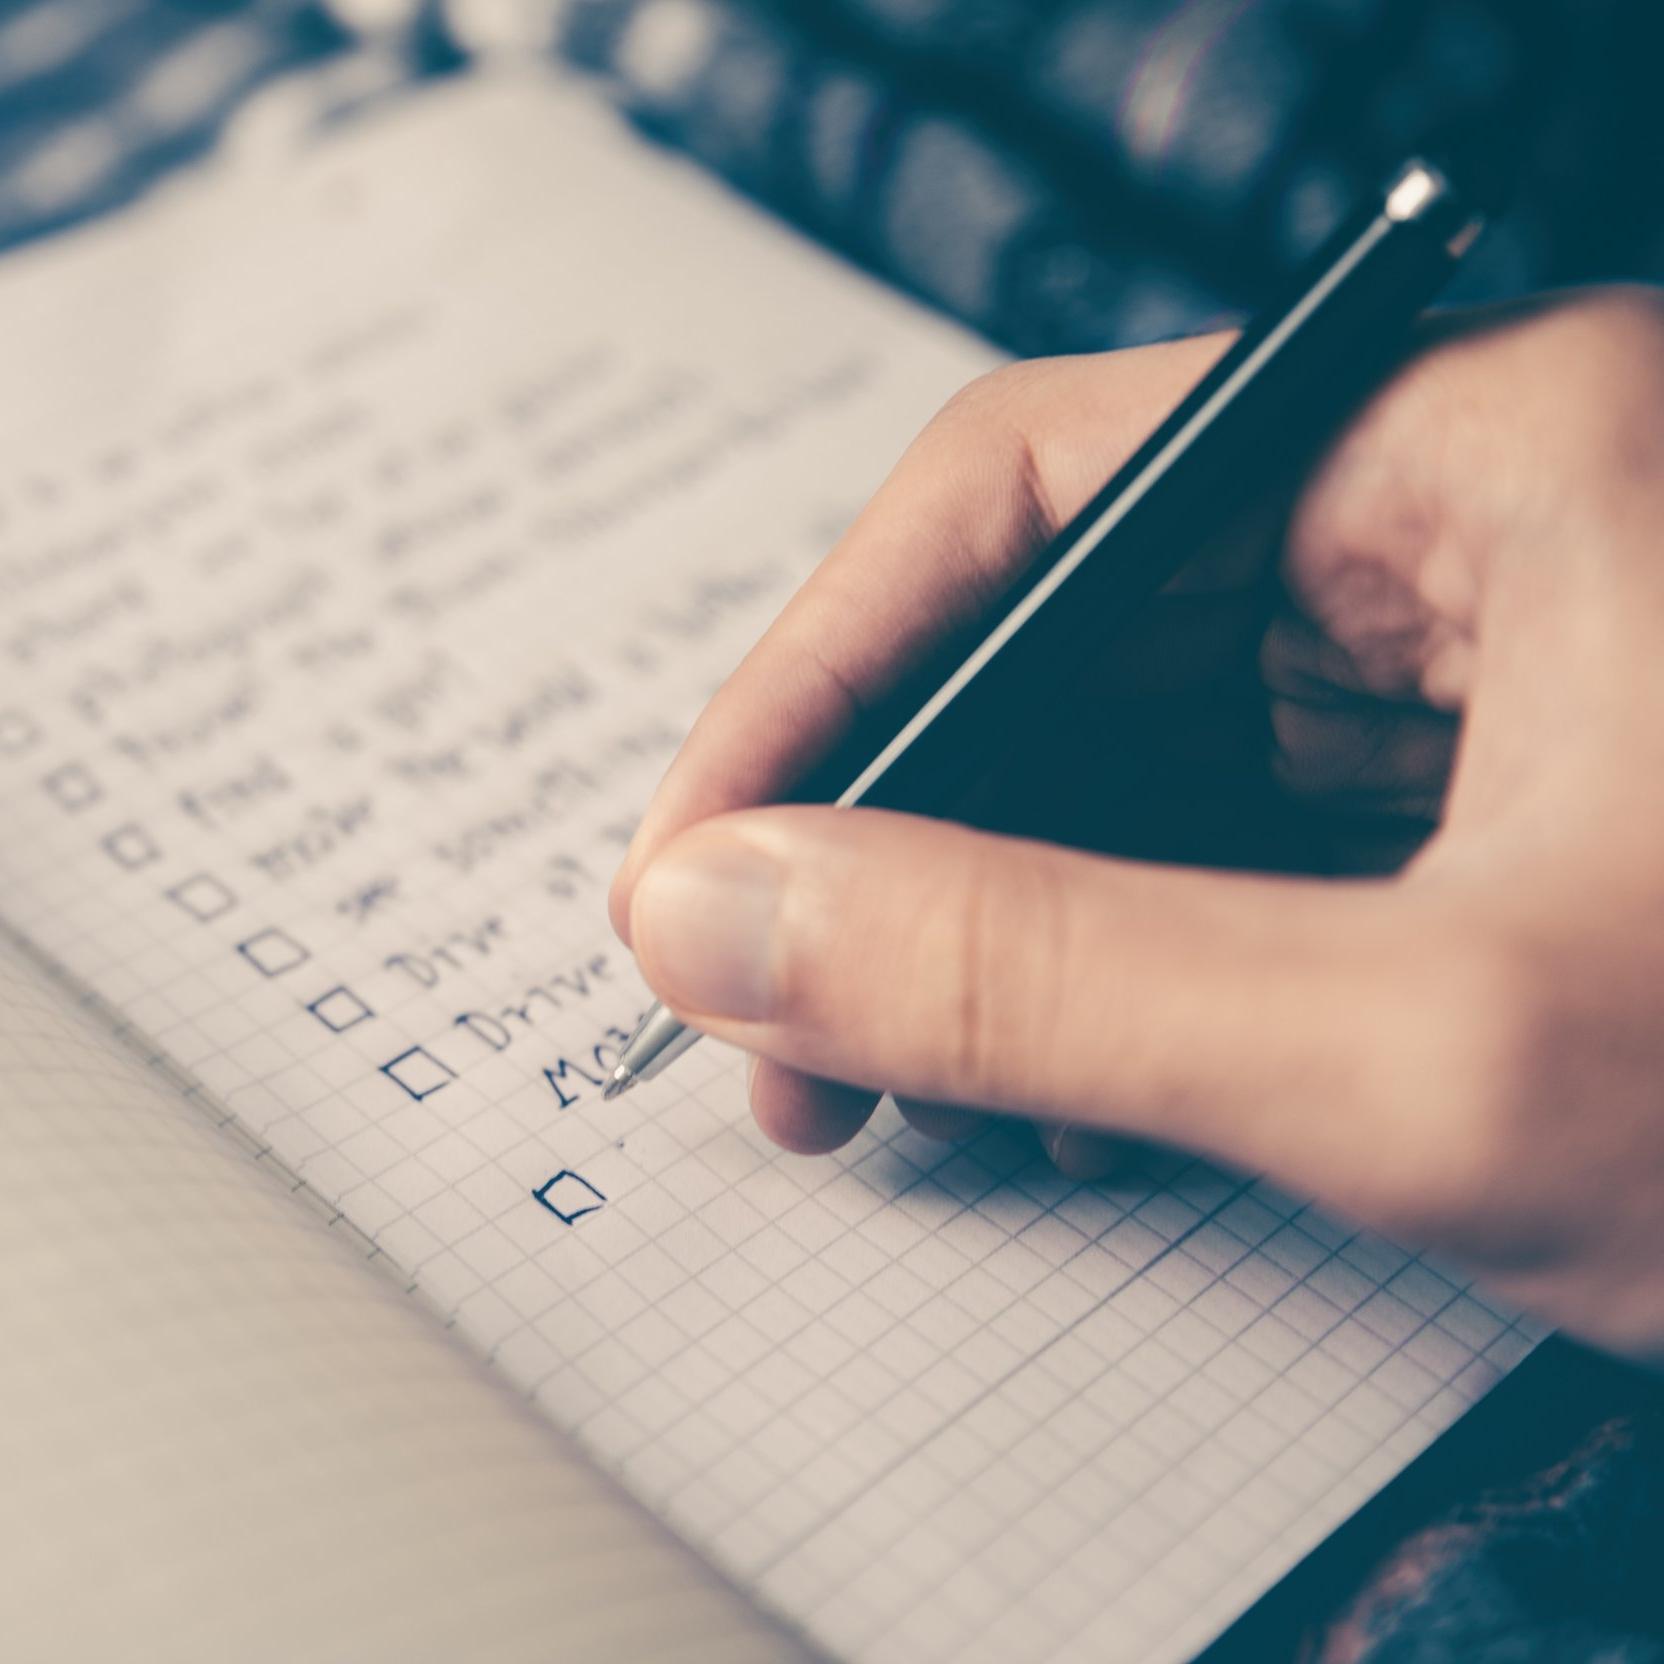 Leaving Well Checklist.jpg